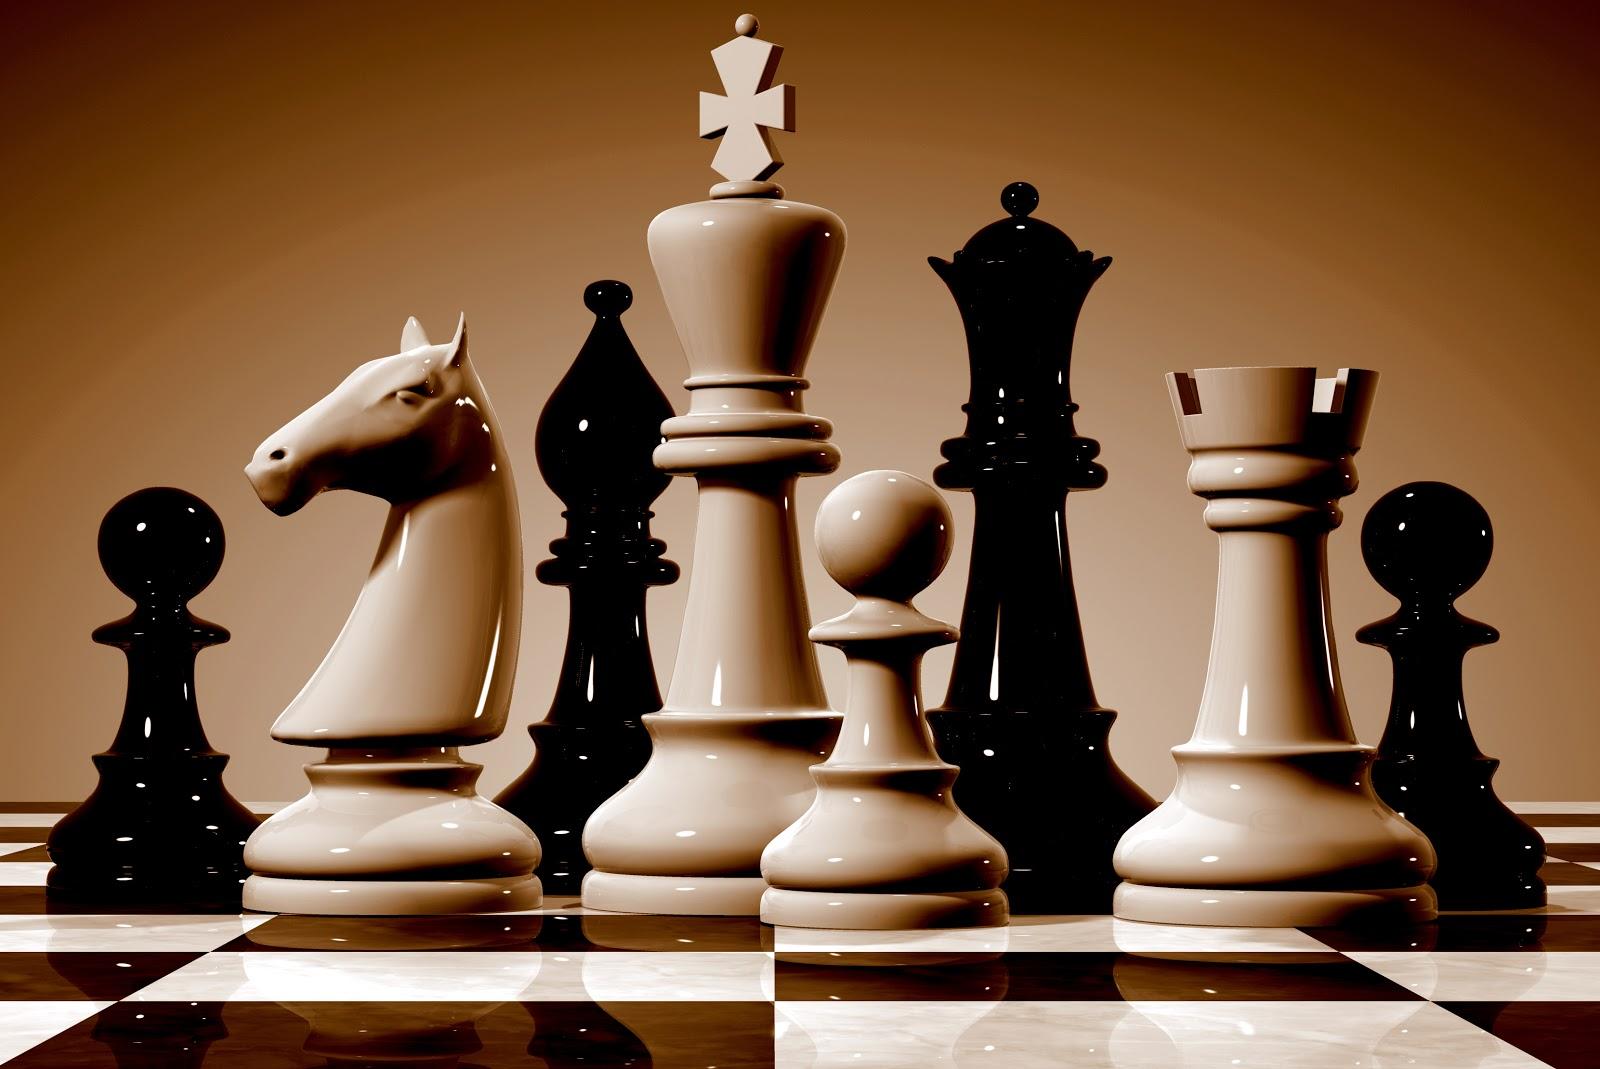 Satranç Nedir? Satranç ile ilgili bilgi